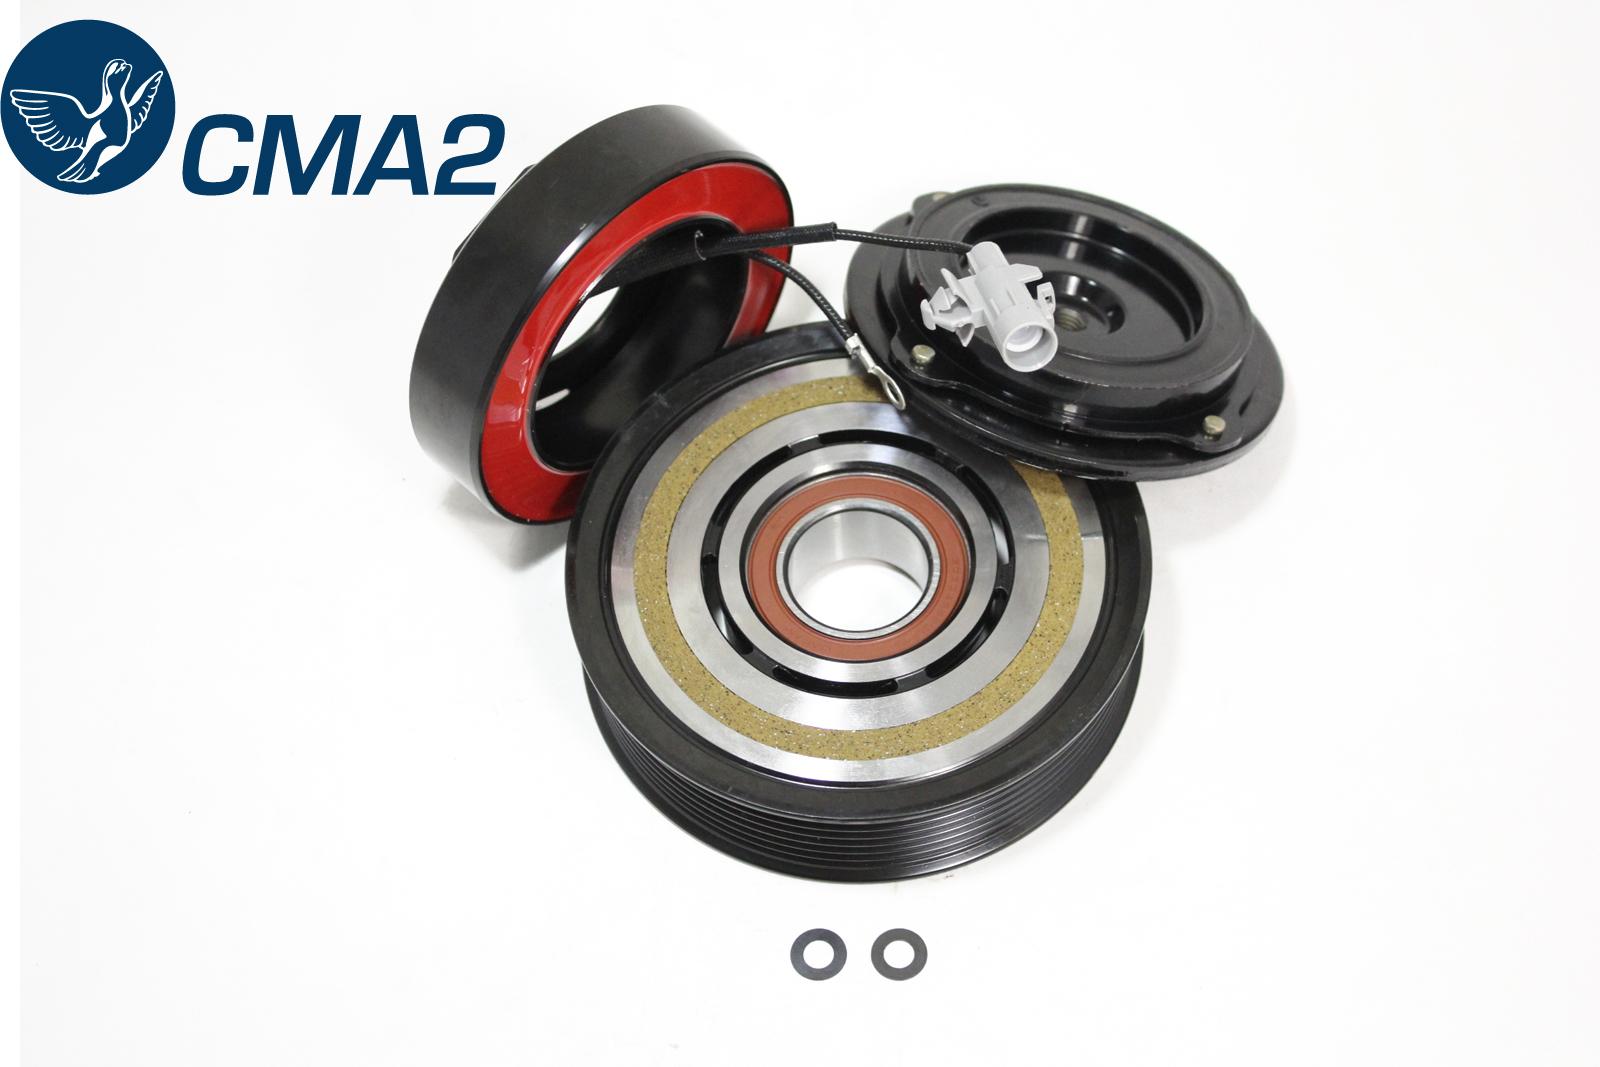 Муфта компрессора кондиционера Тойота Ленд Крузер Прадо 120 3.0 Diesel 1KDFTV, 8841035400, 88410-35400.